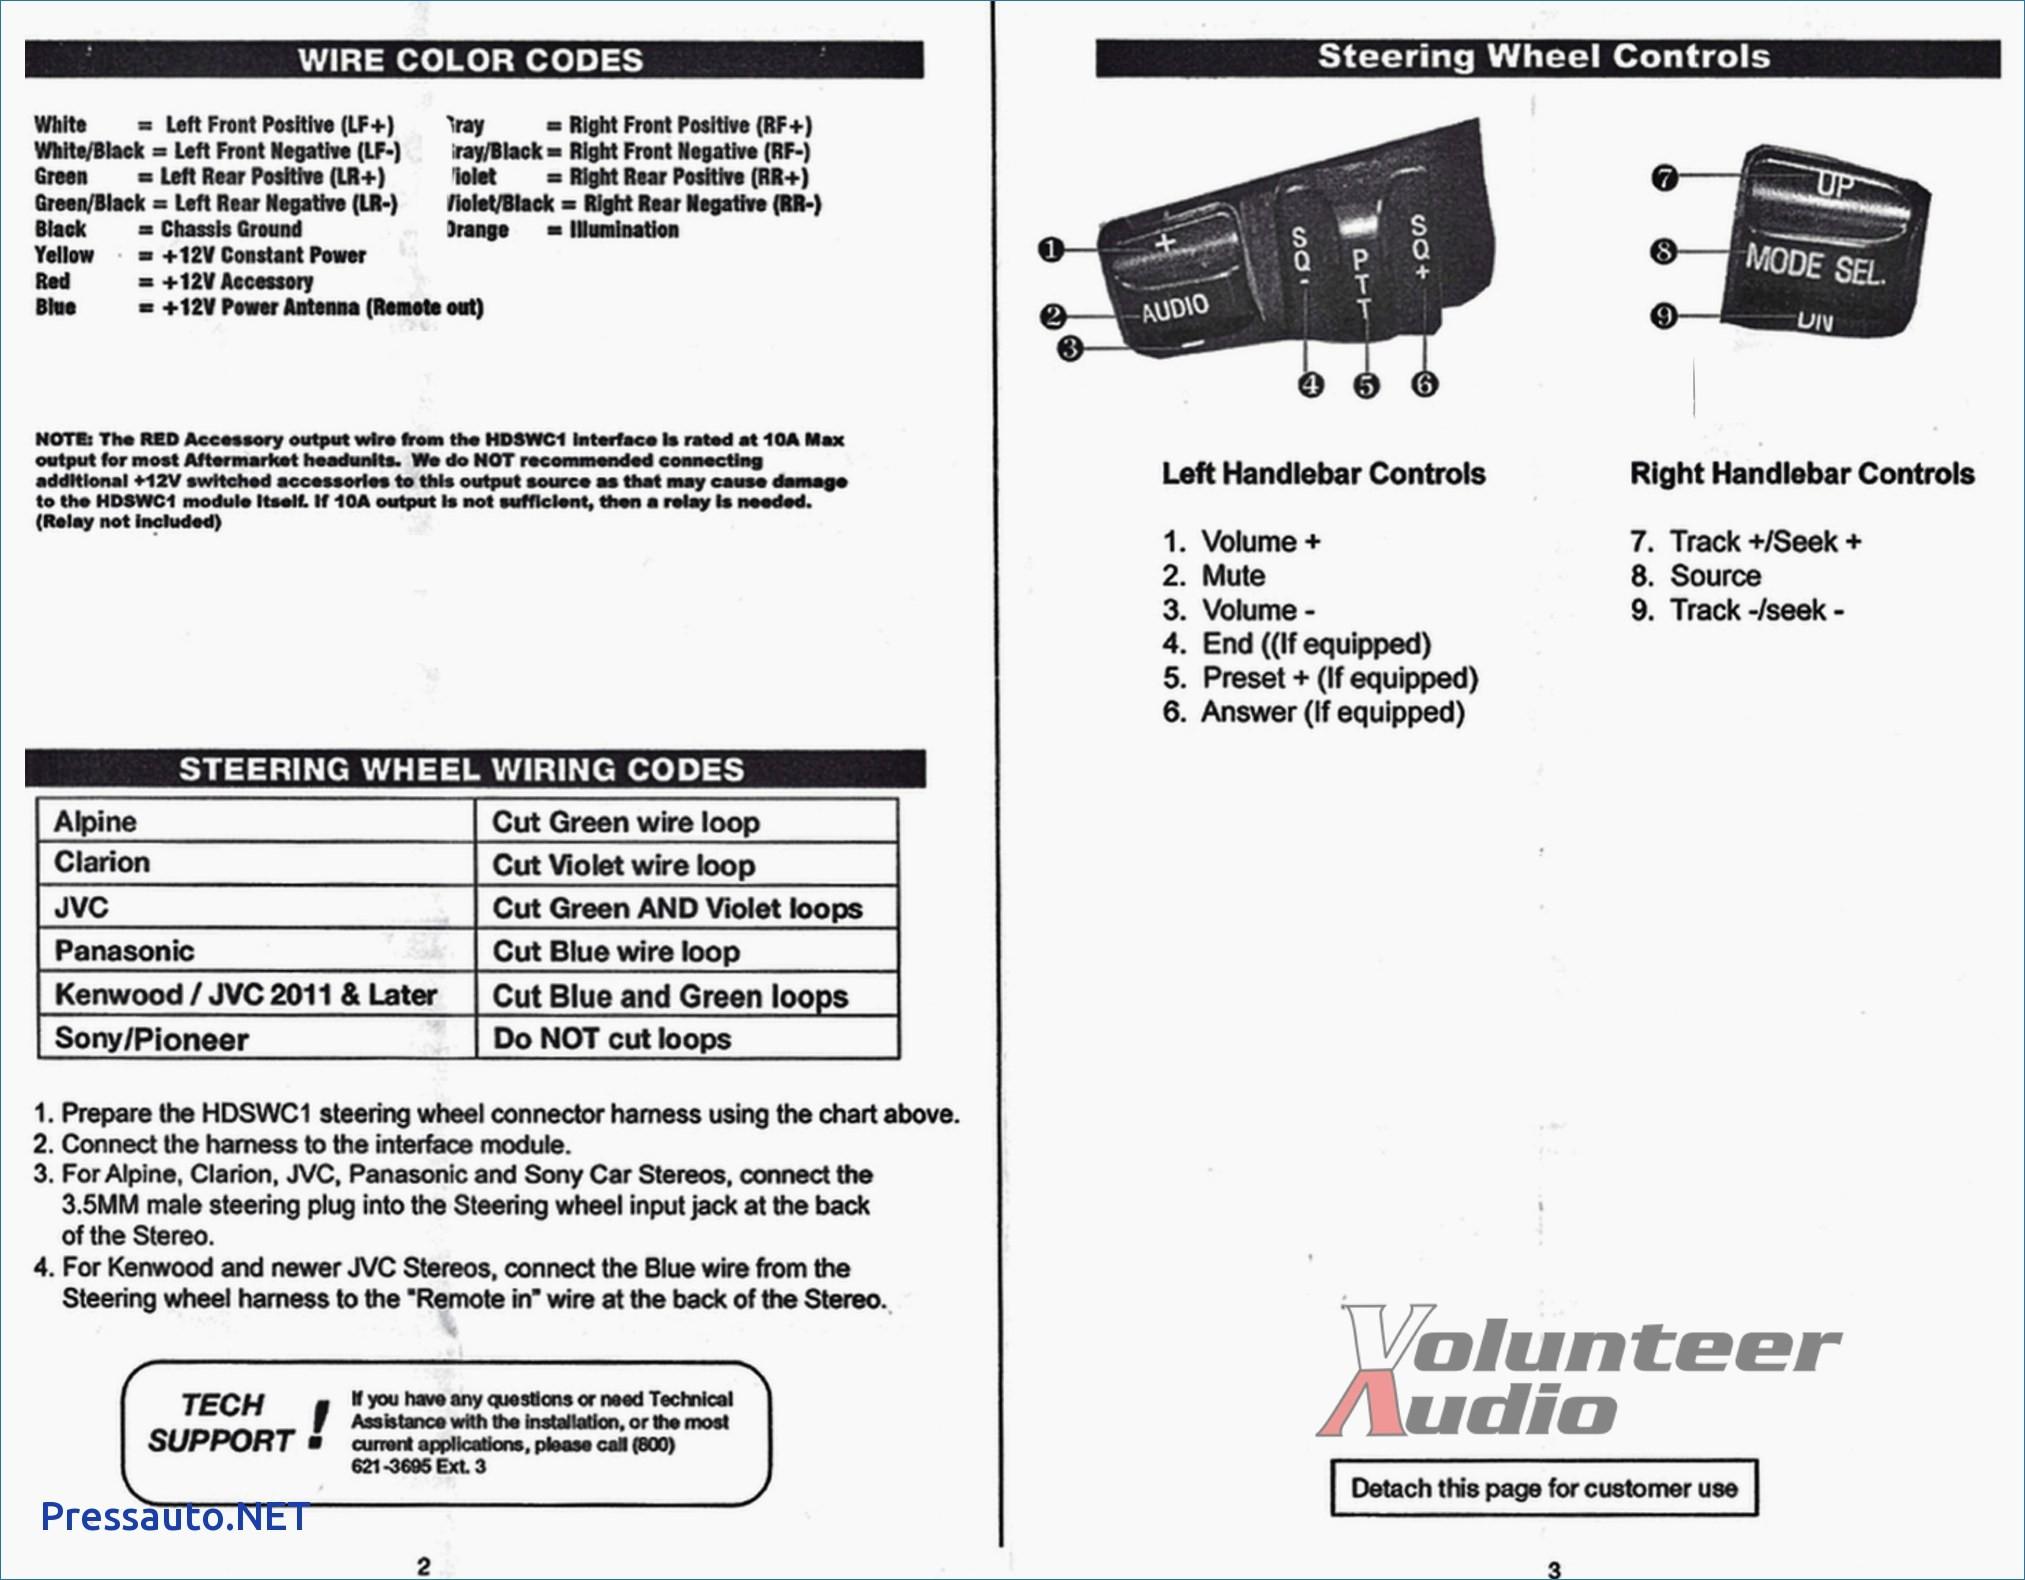 Arnolt Bristol Wiring Diagram Free Diagrams Suzuki Gs750 Clarion Cx501 Image